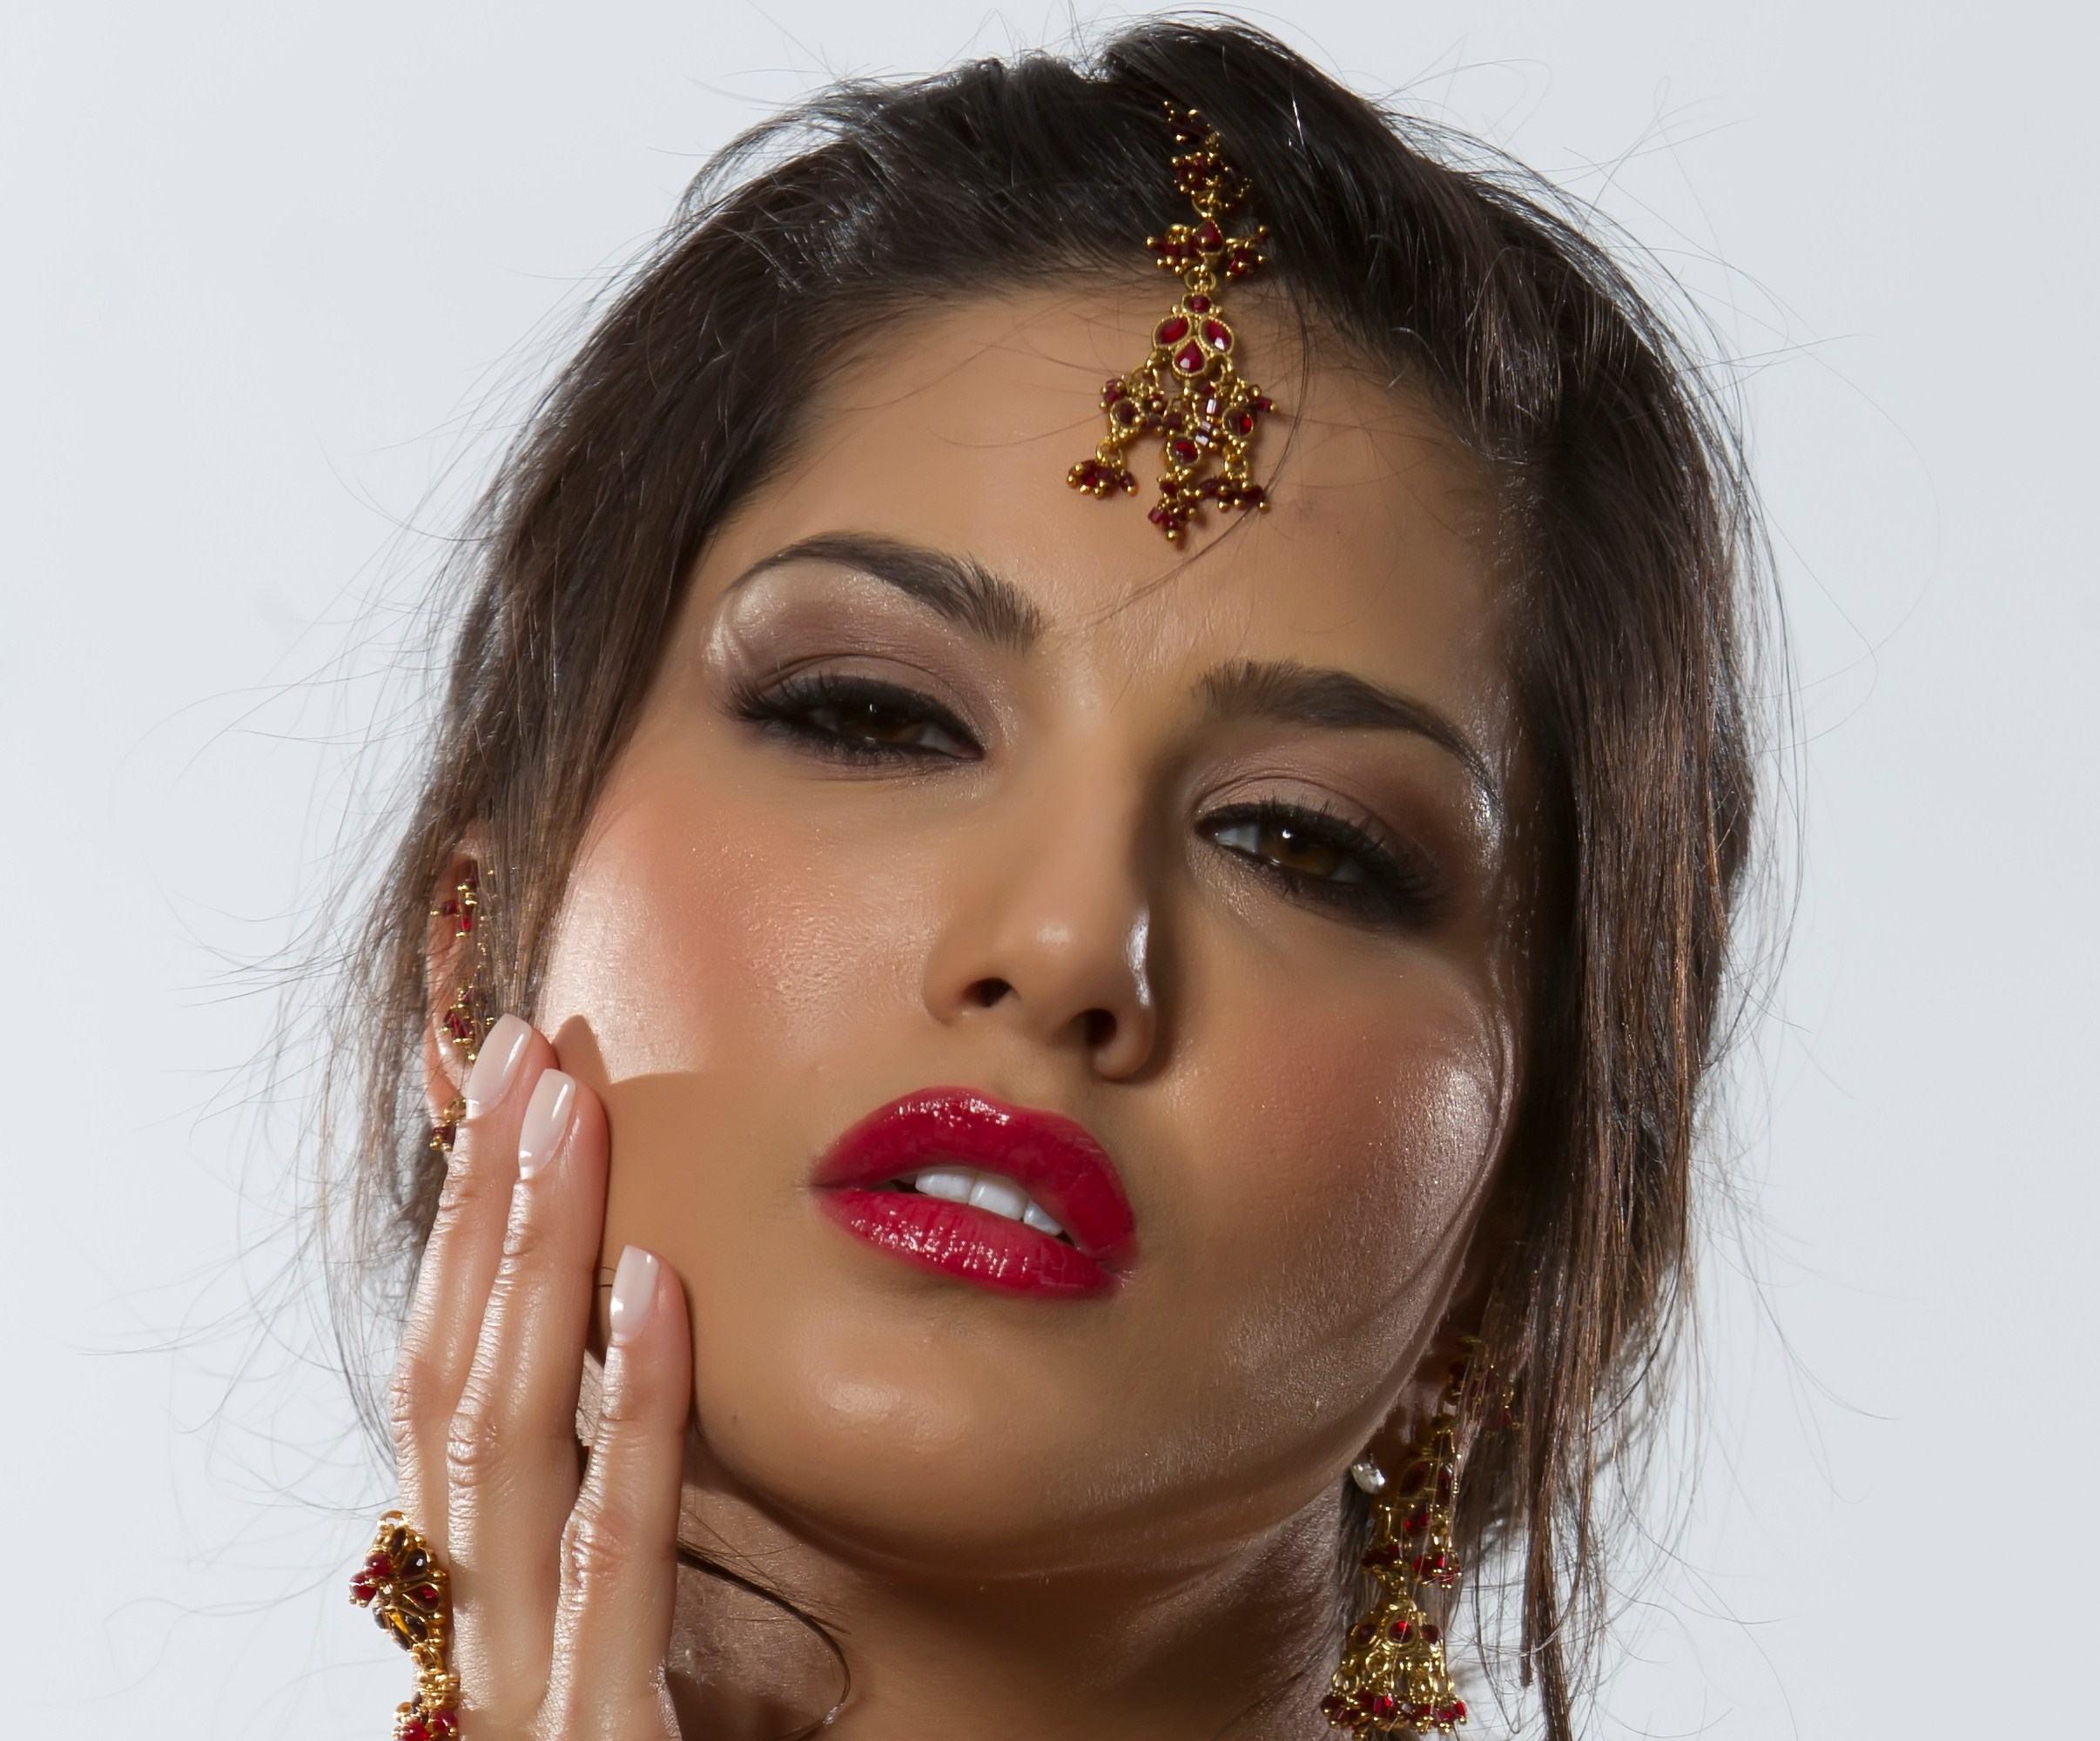 Sunny Leone HD Pics 546739057, Chasity Musla